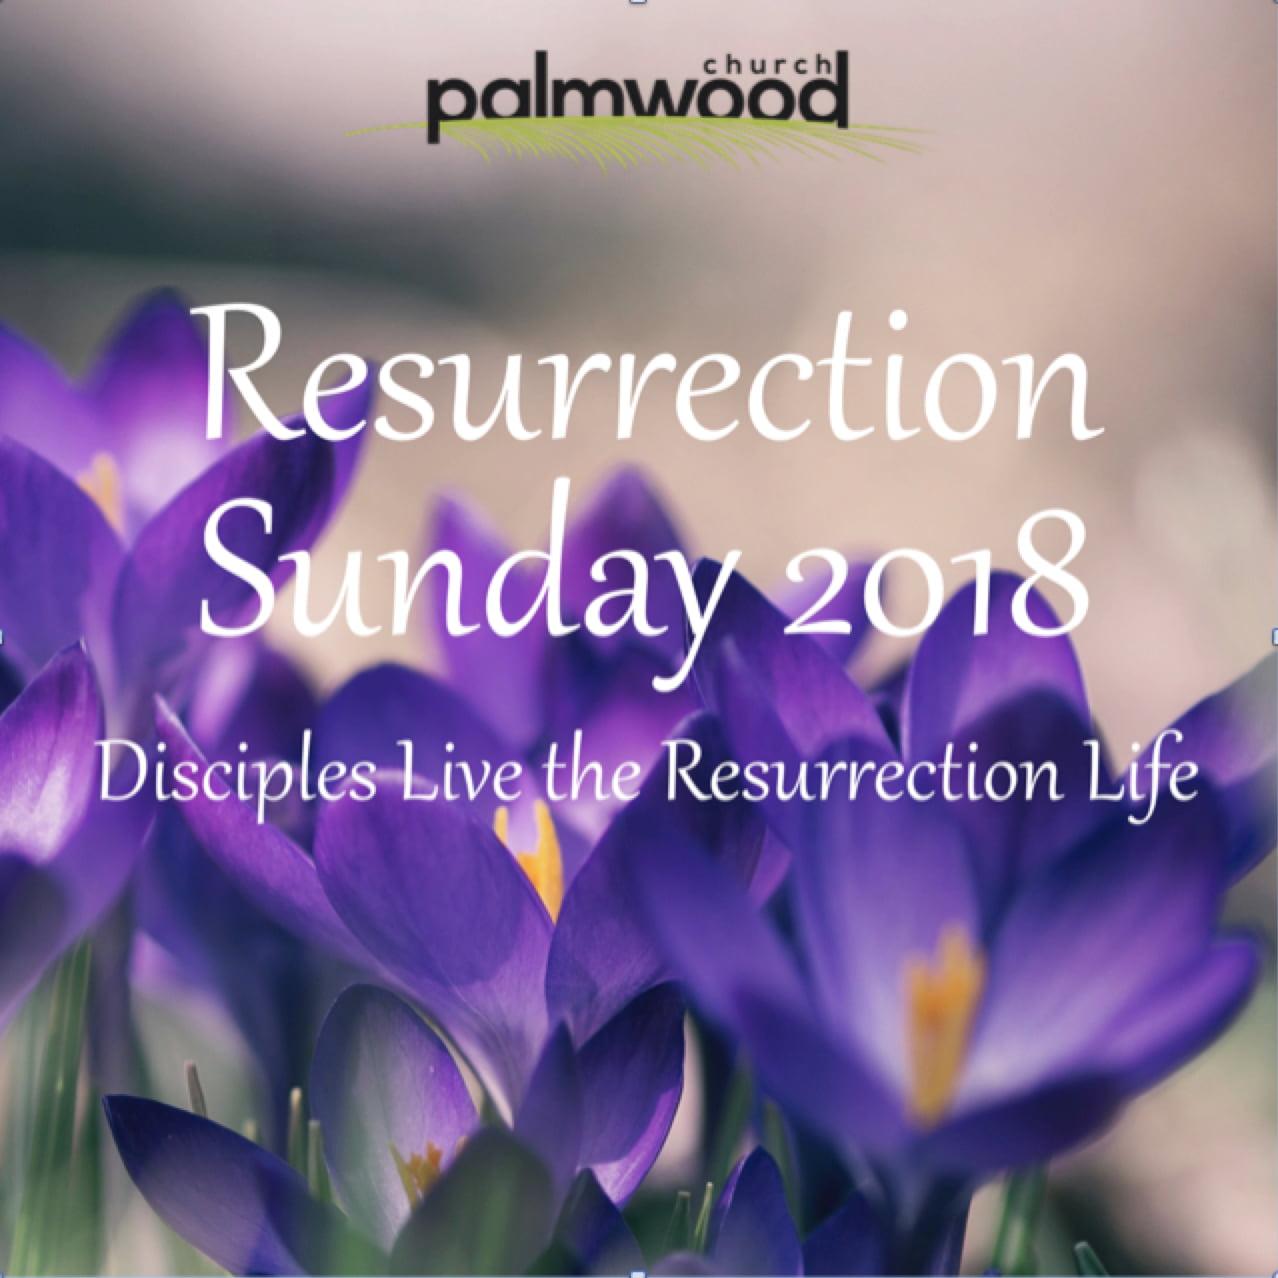 Disciples Live the Resurrection Life